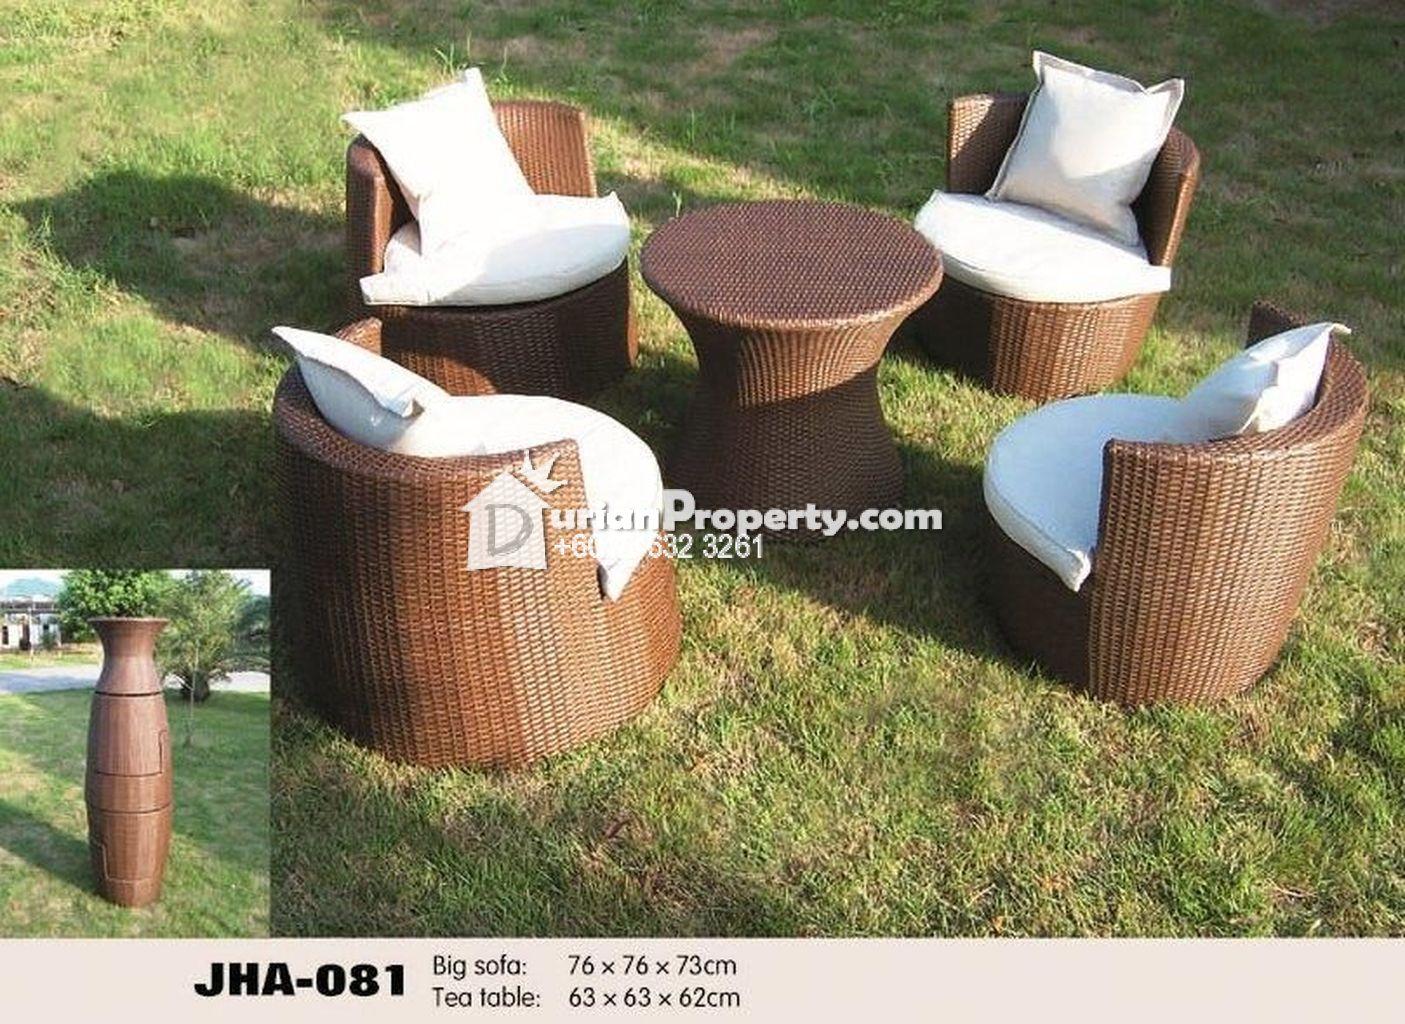 wicker patio sofa sets For Sale